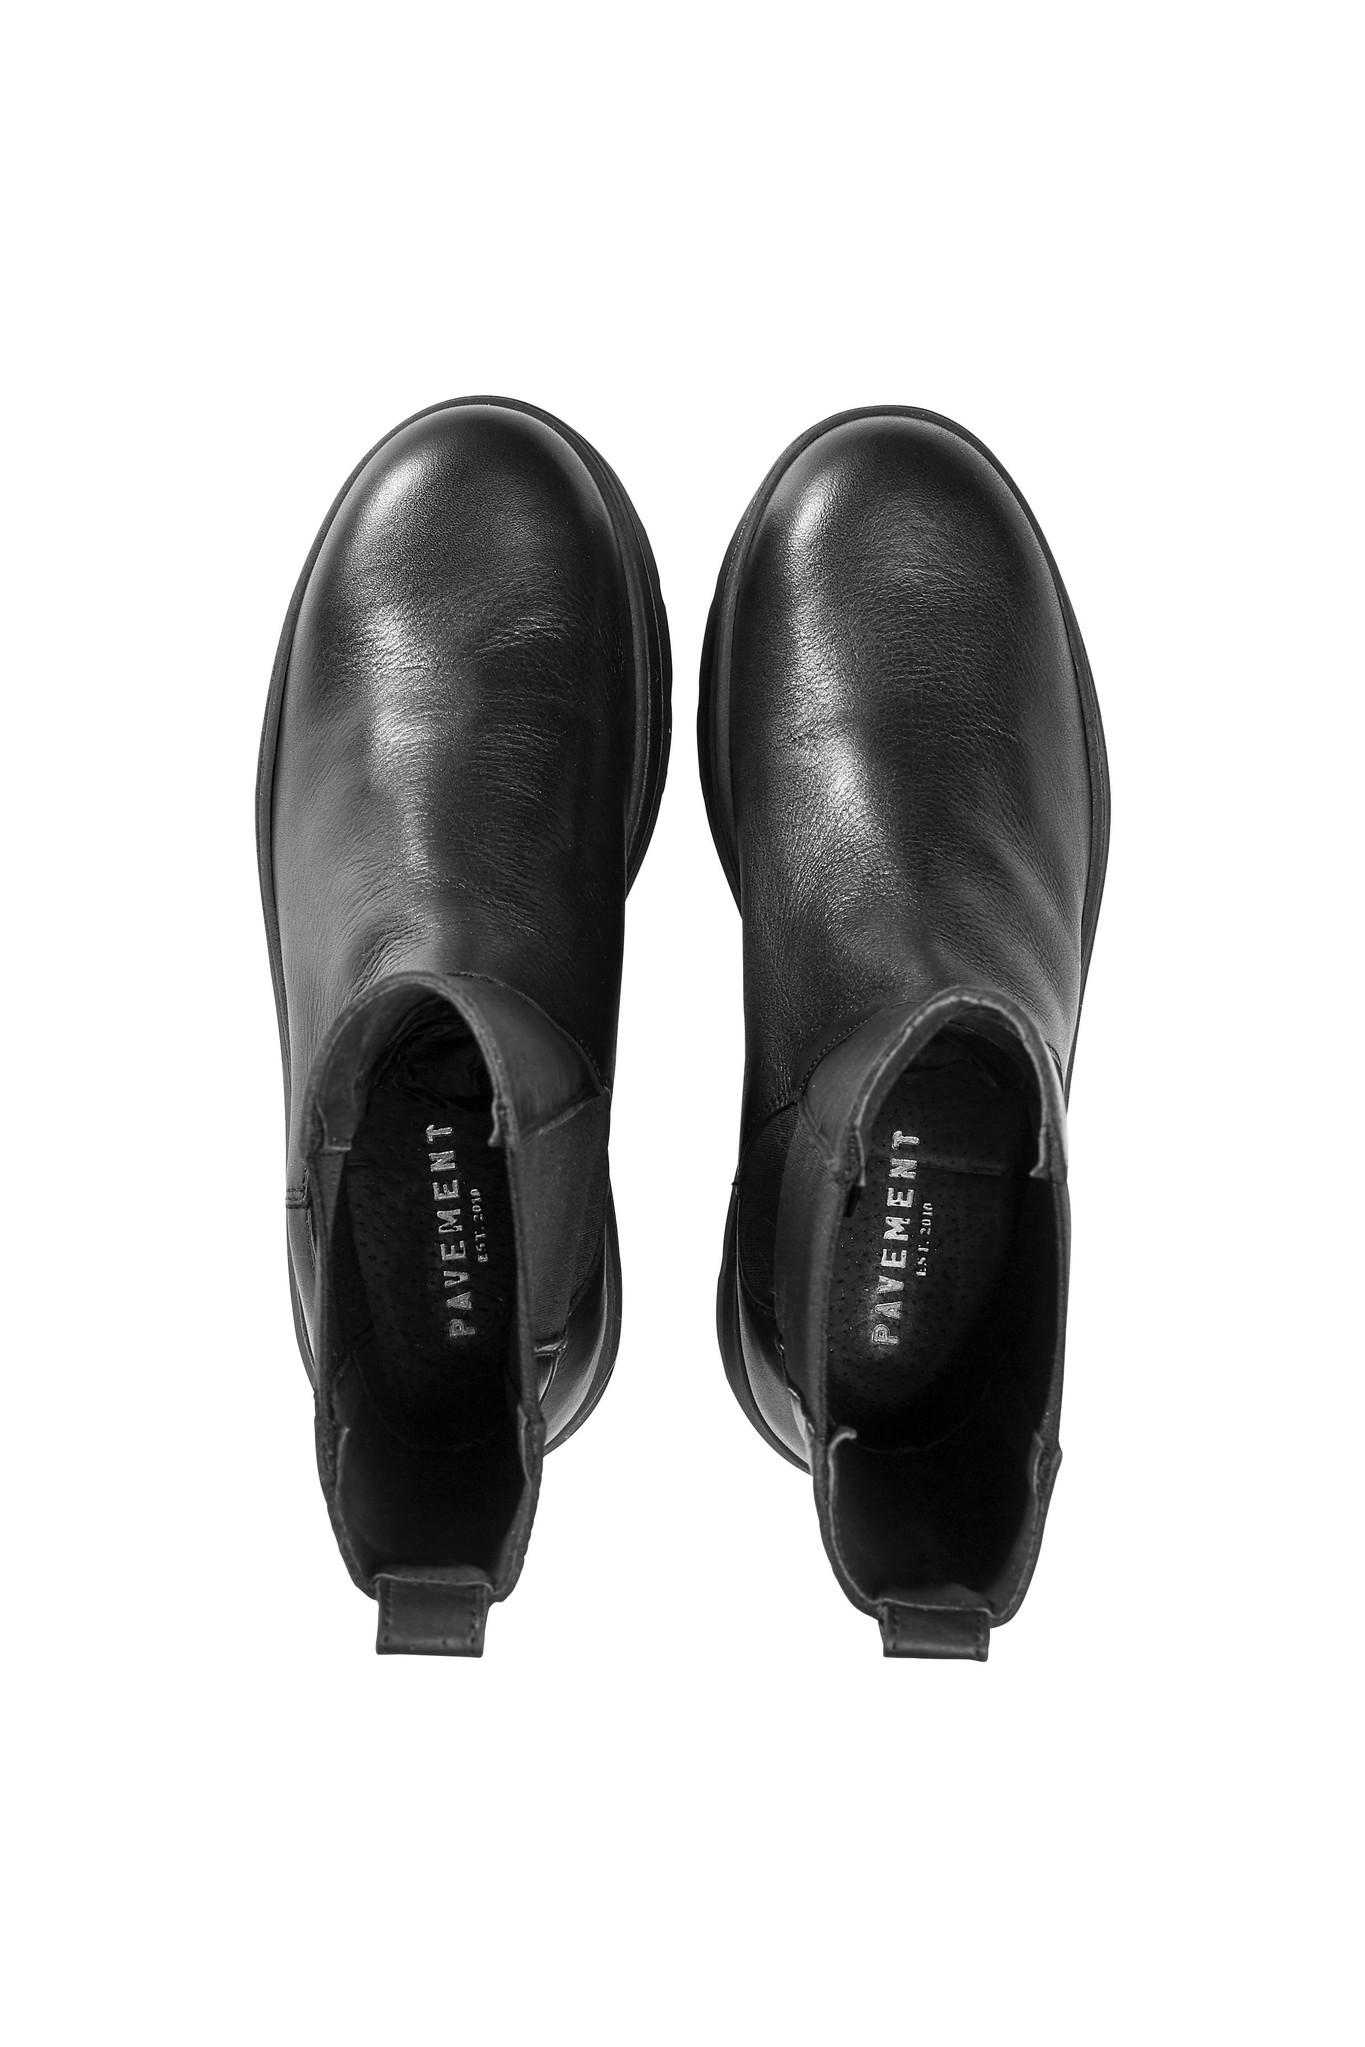 Aya Leather Boot - Black-3